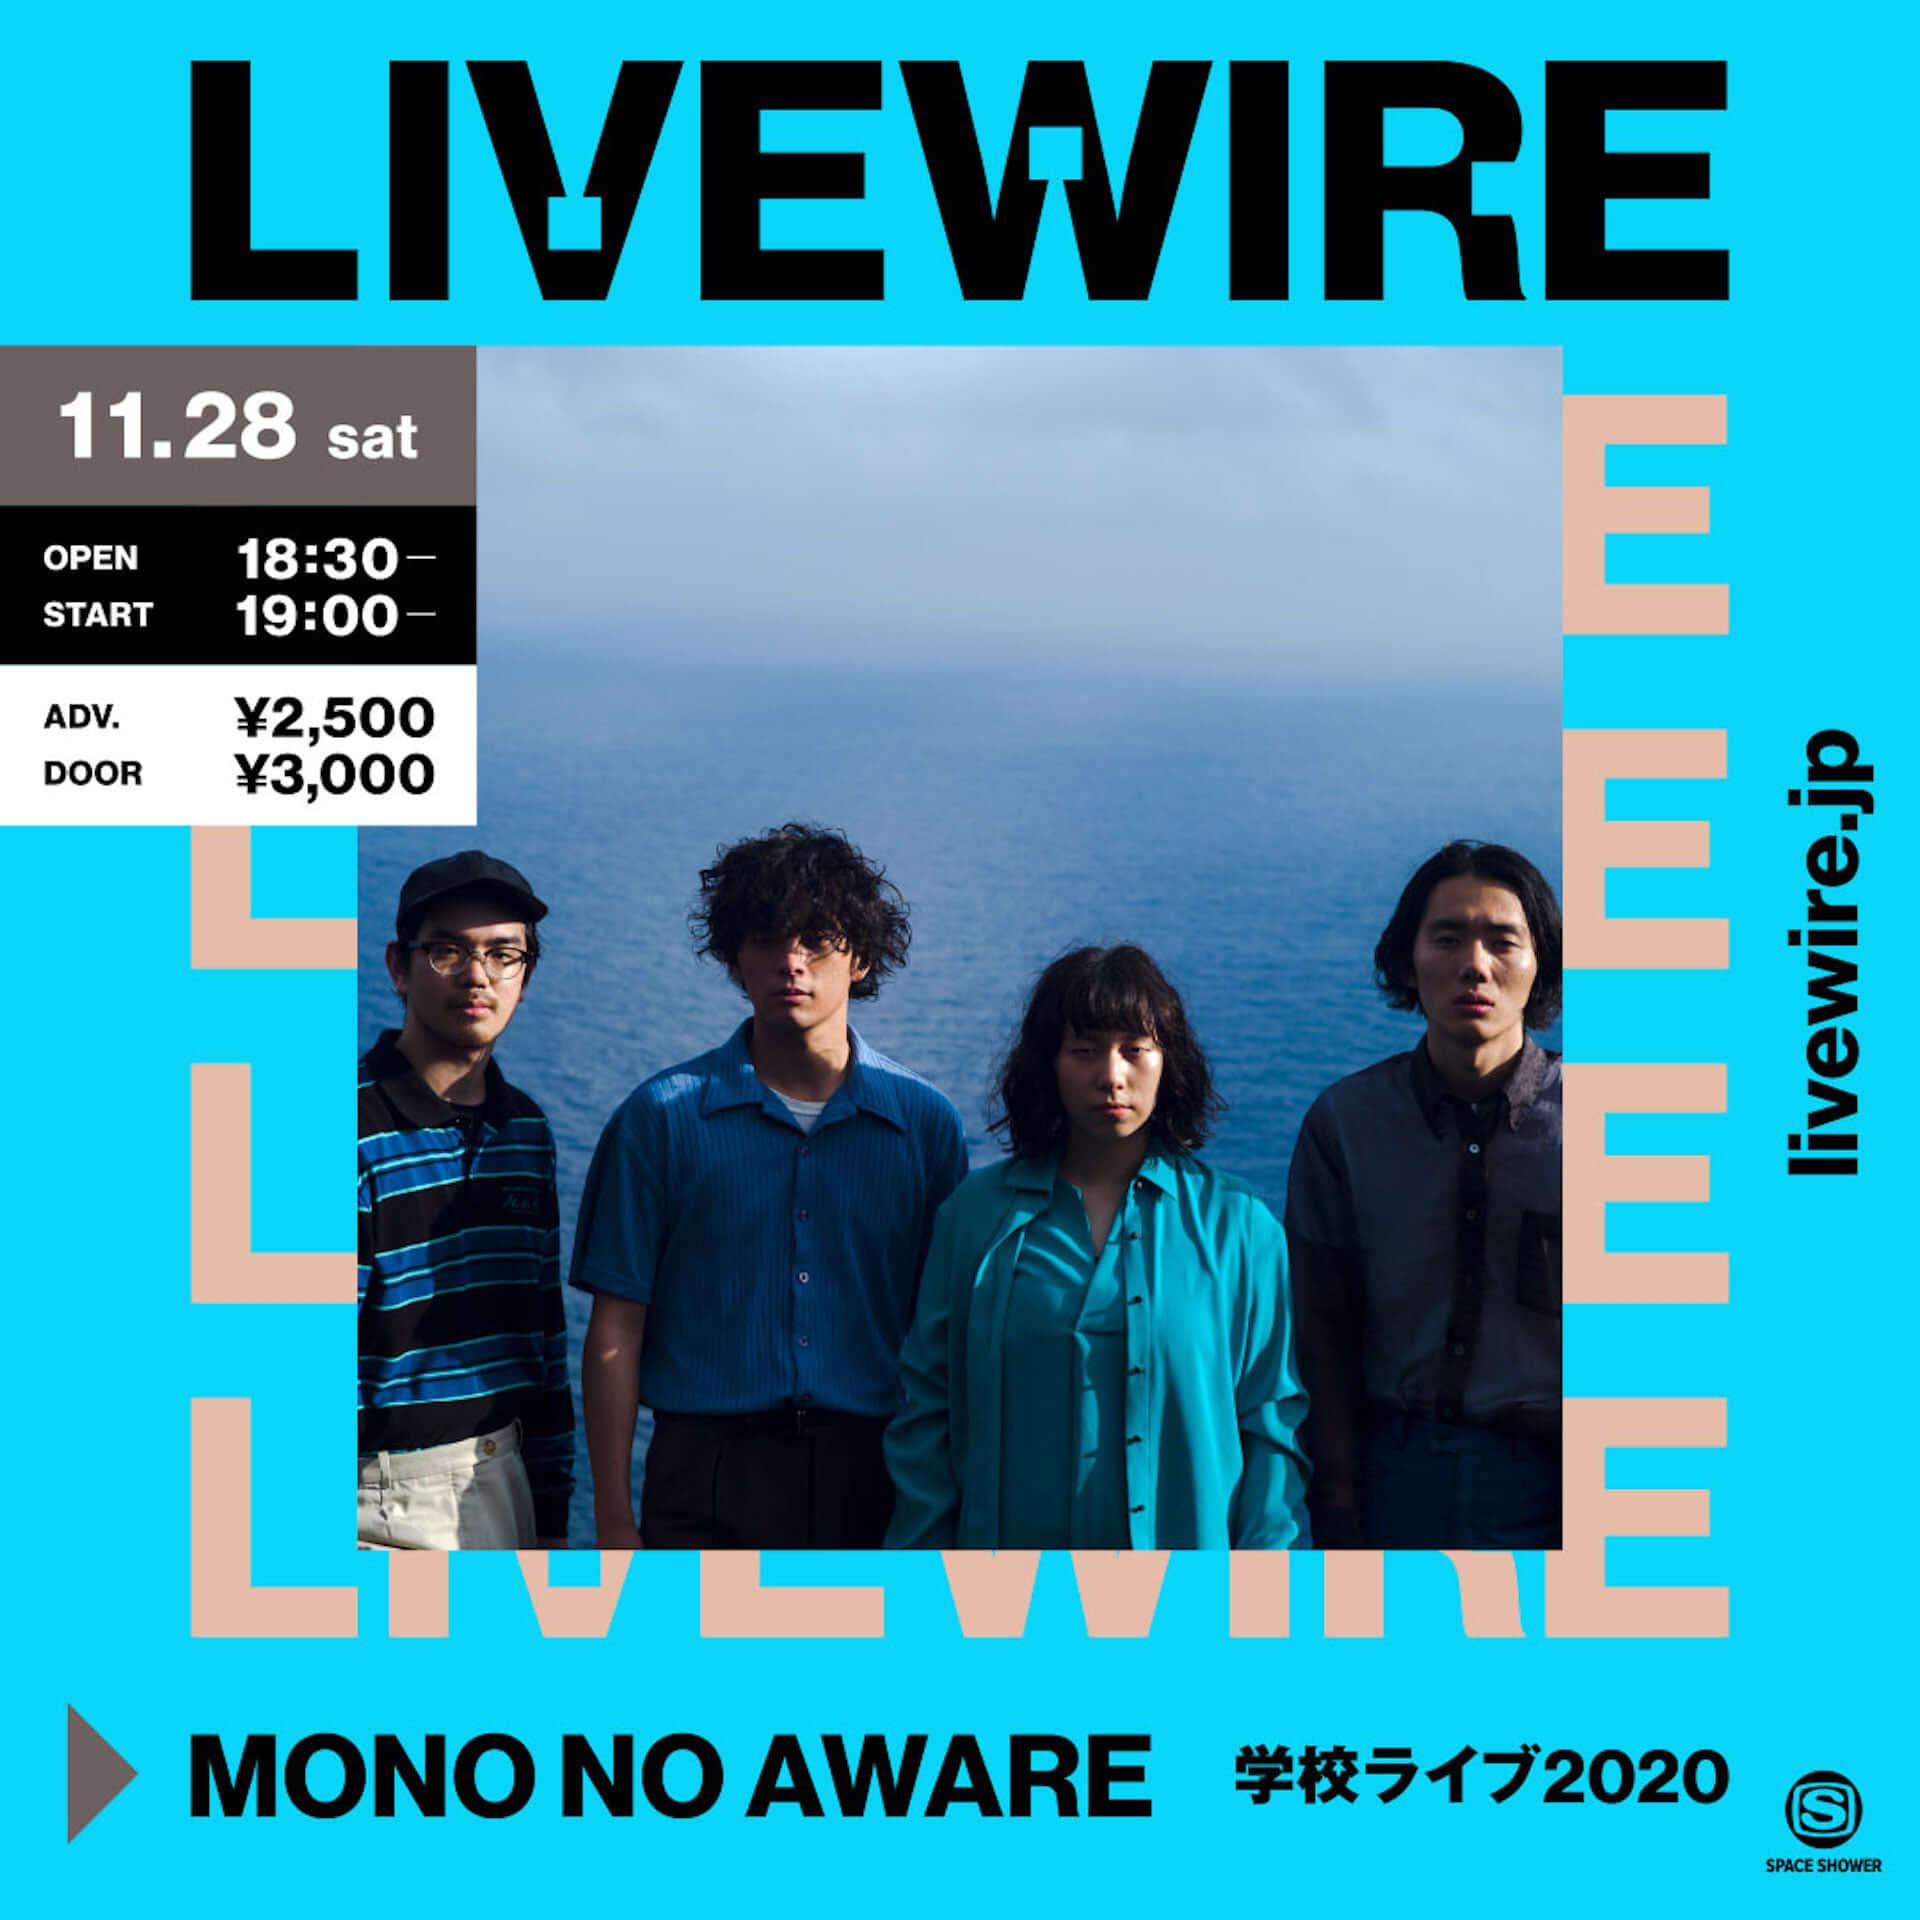 MONO NO AWARE初の単独生配信ライブが<LIVEWIRE>にて開催決定!玉置周啓のコメントも到着 music201102_mononoaware_1-1920x1920